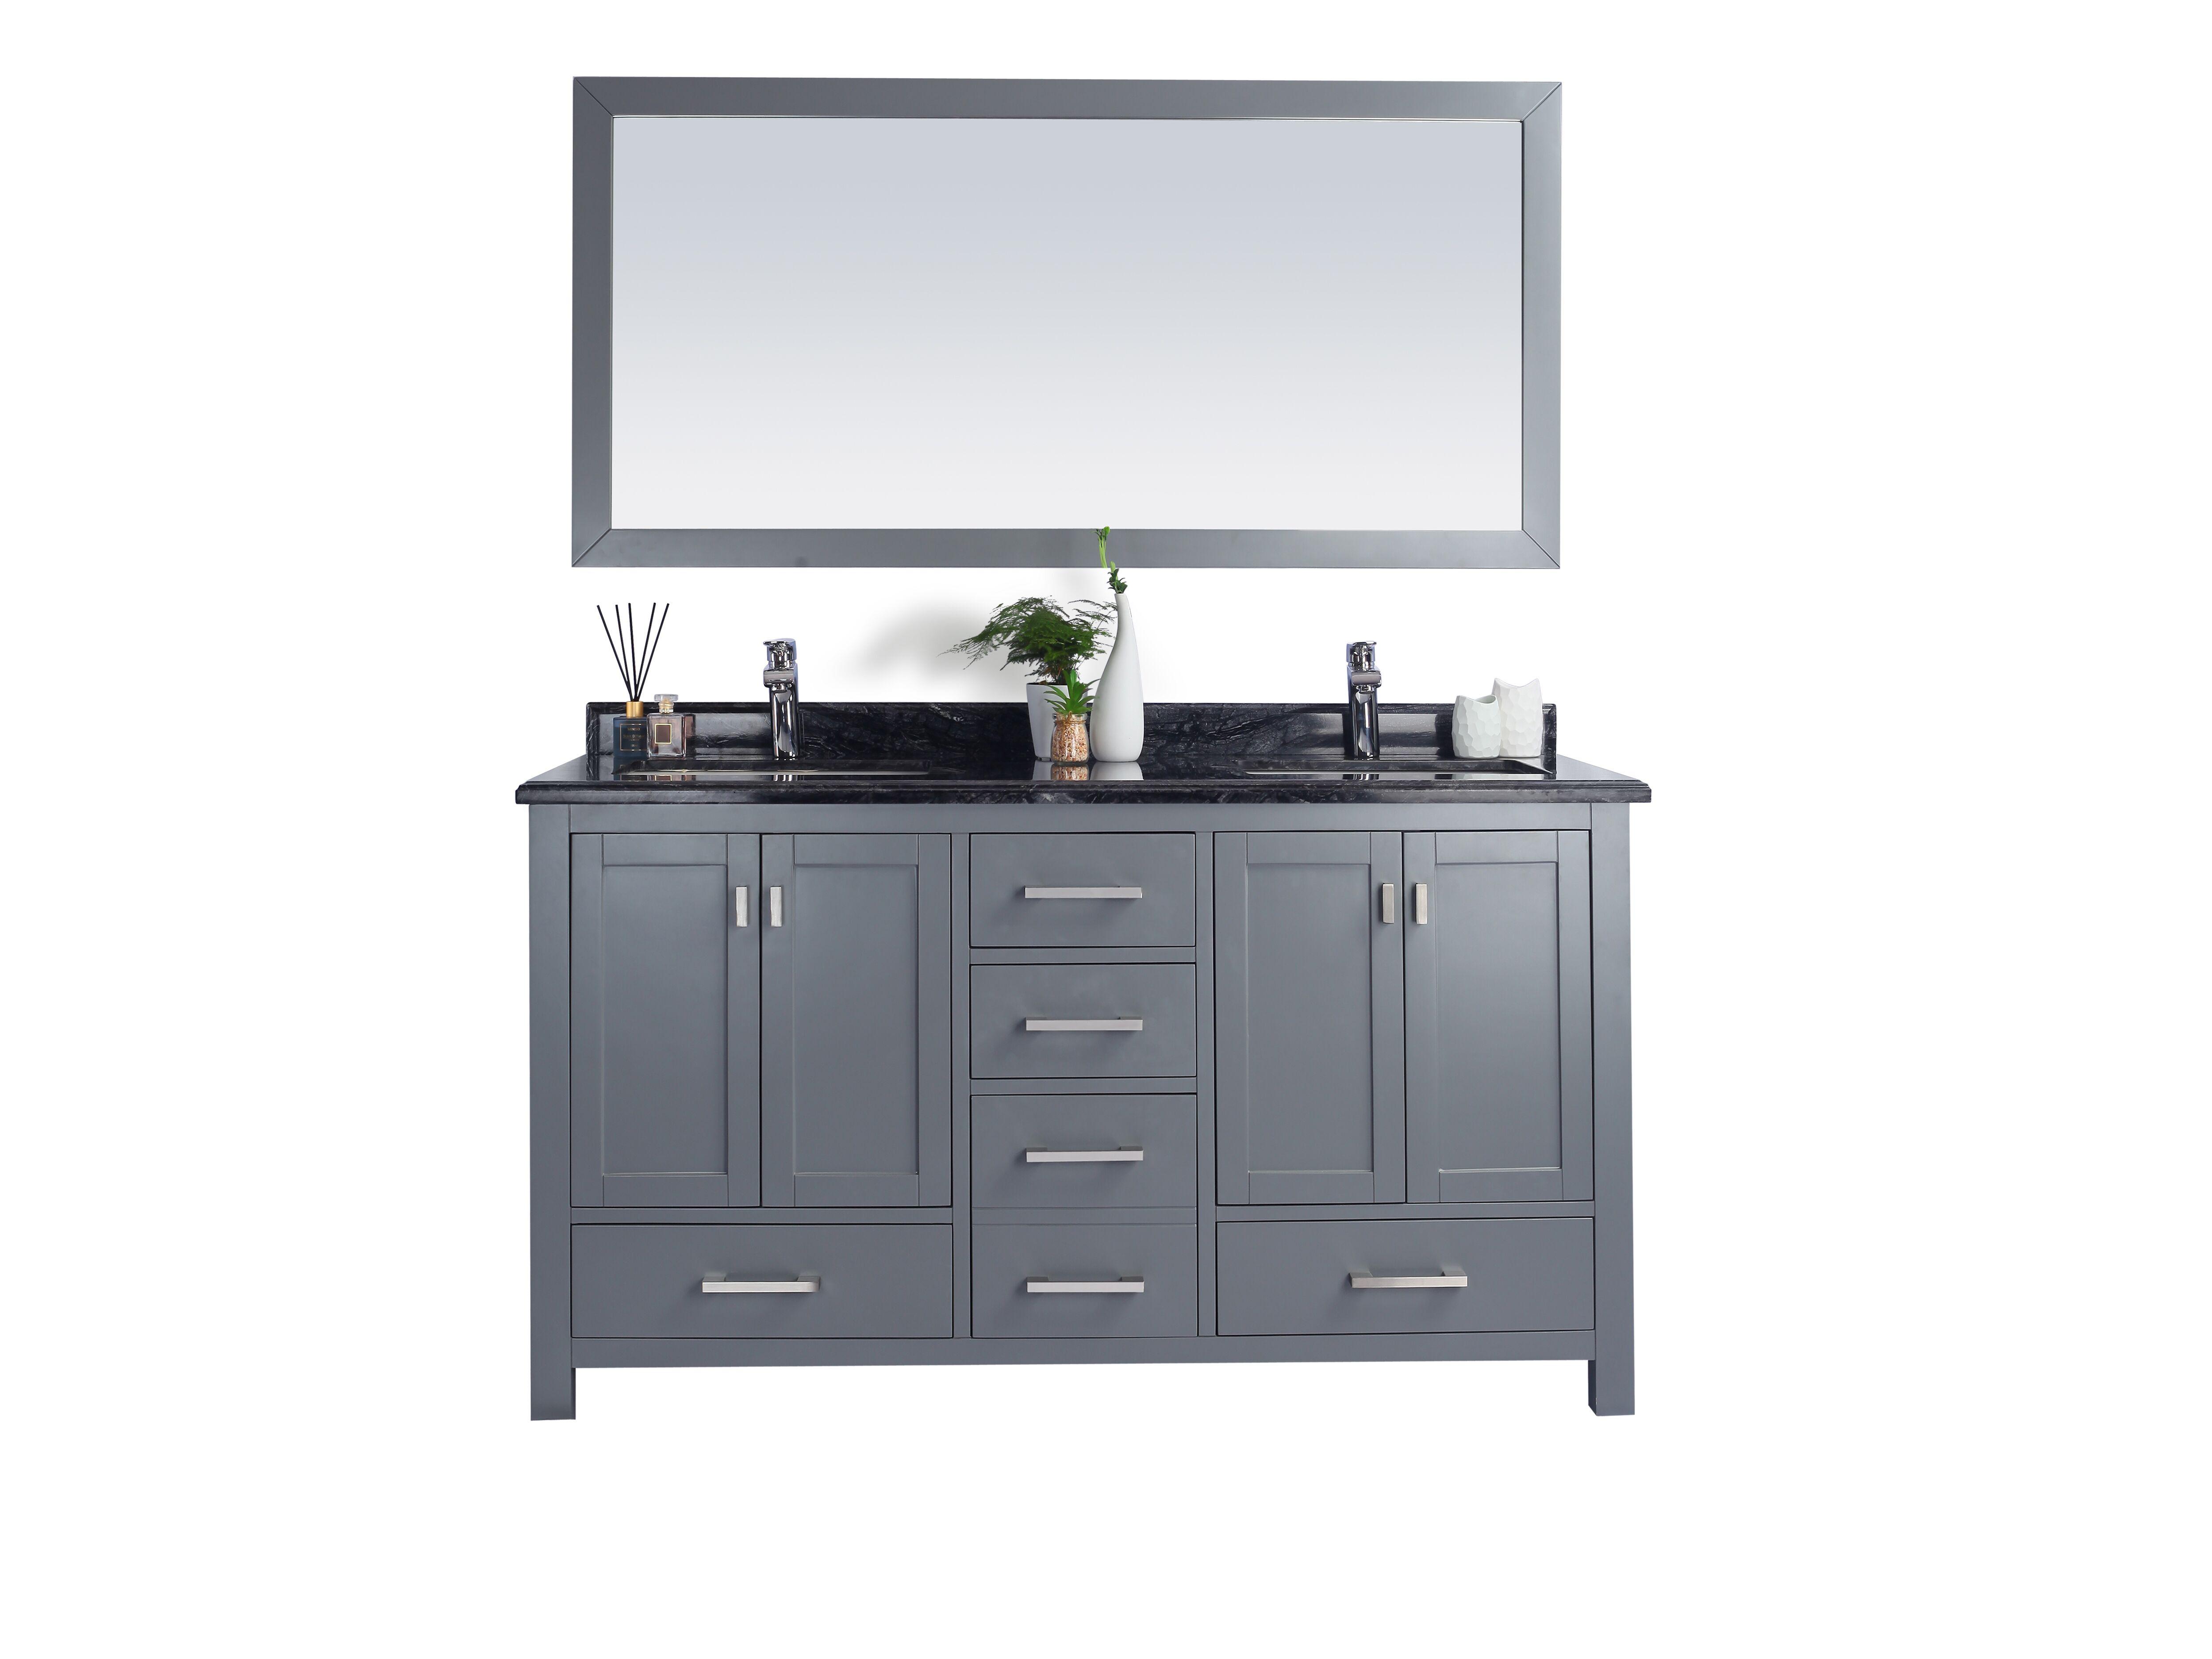 "60"" Double Sink Bathroom Vanity Cabinet + Countertop and Mirror Options"